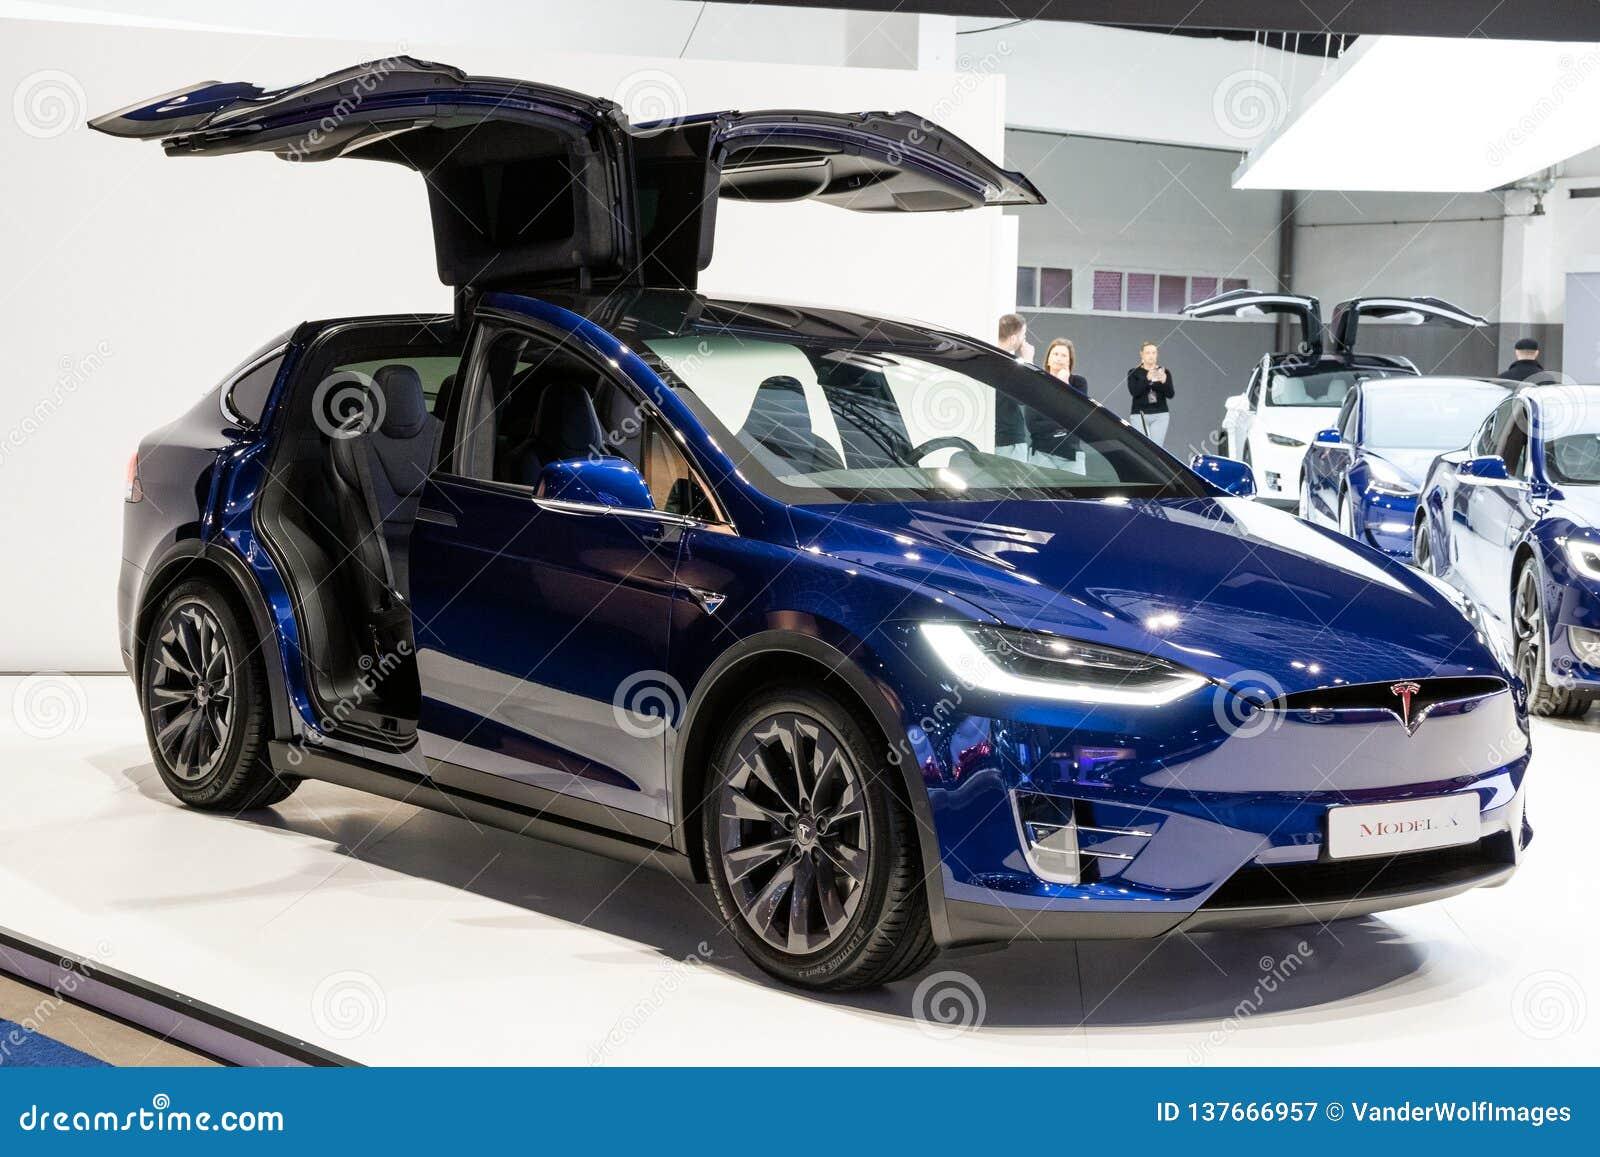 2019 Tesla Model X 2019 Tesla Model S - Noticias Modelo